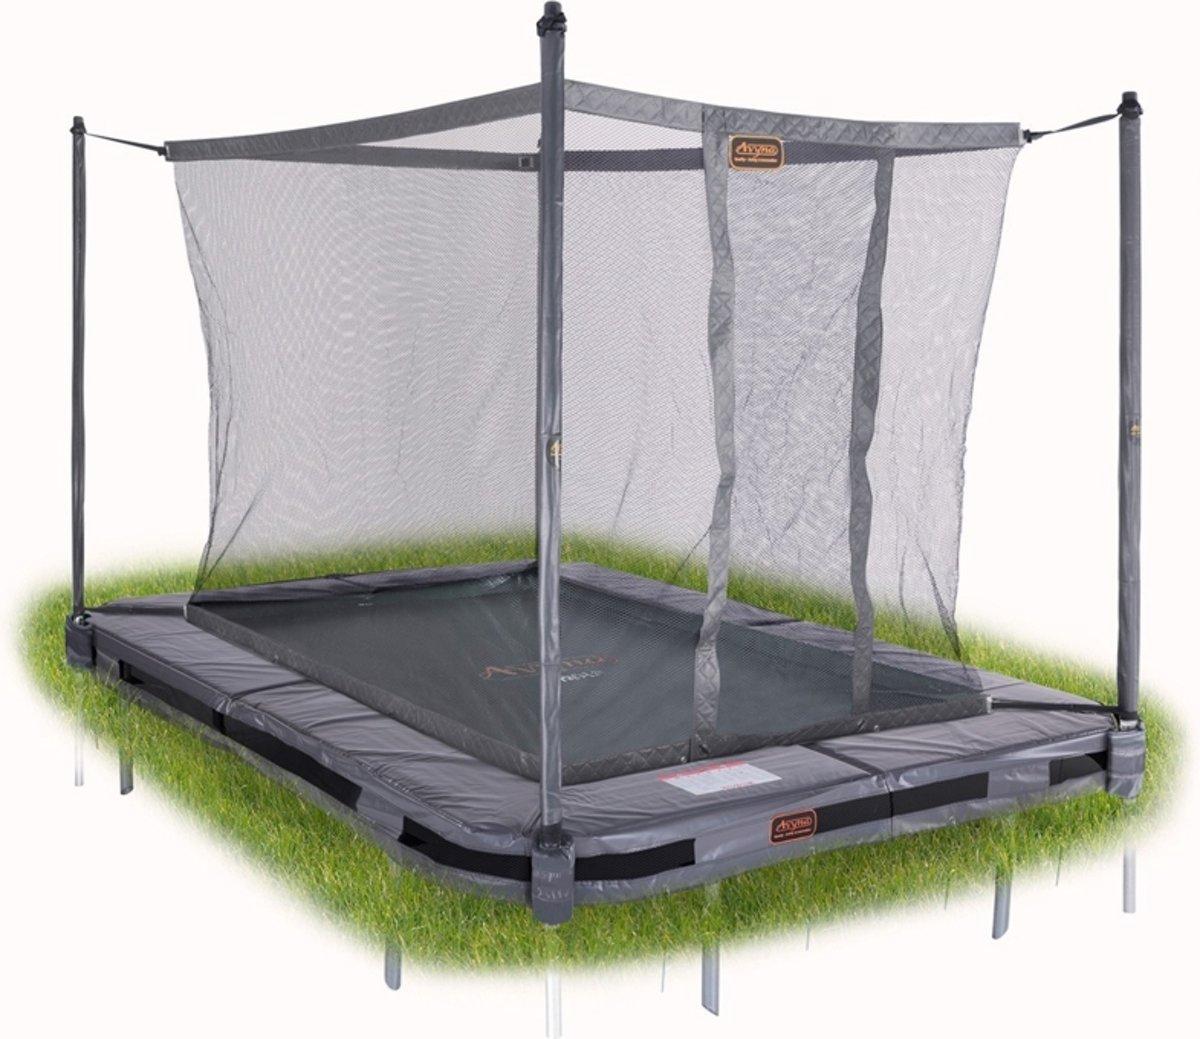 Avyna InGround trampoline PRO-LINE 275x190 (213) Grijs + Avyna Veiligheidsnet